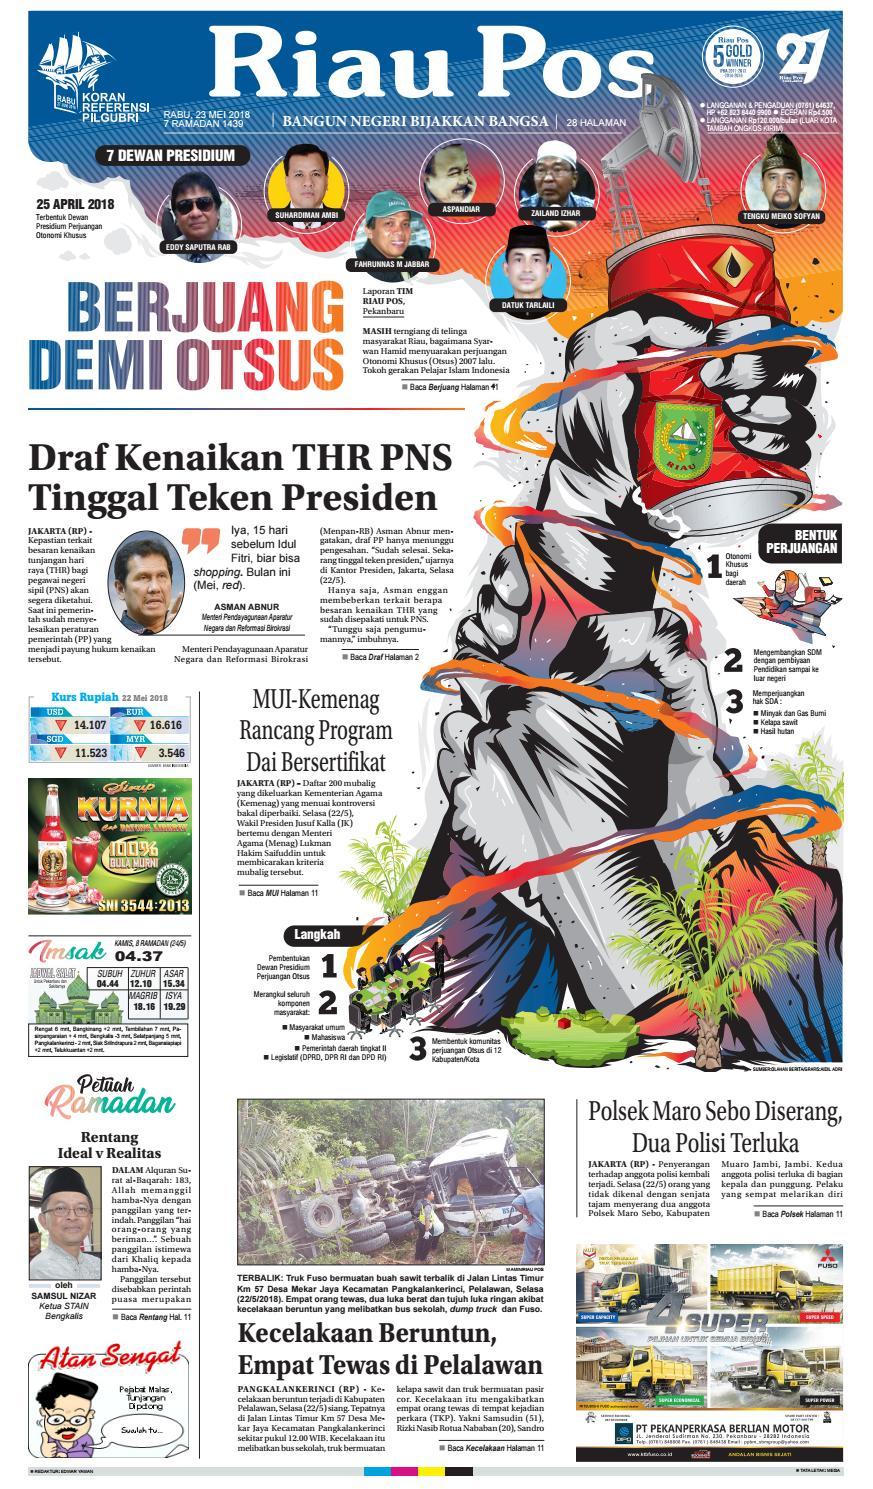 2018 05 23 By Riau Pos Issuu Produk Ukm Bumn Suscho Sus Coklat Surabaya